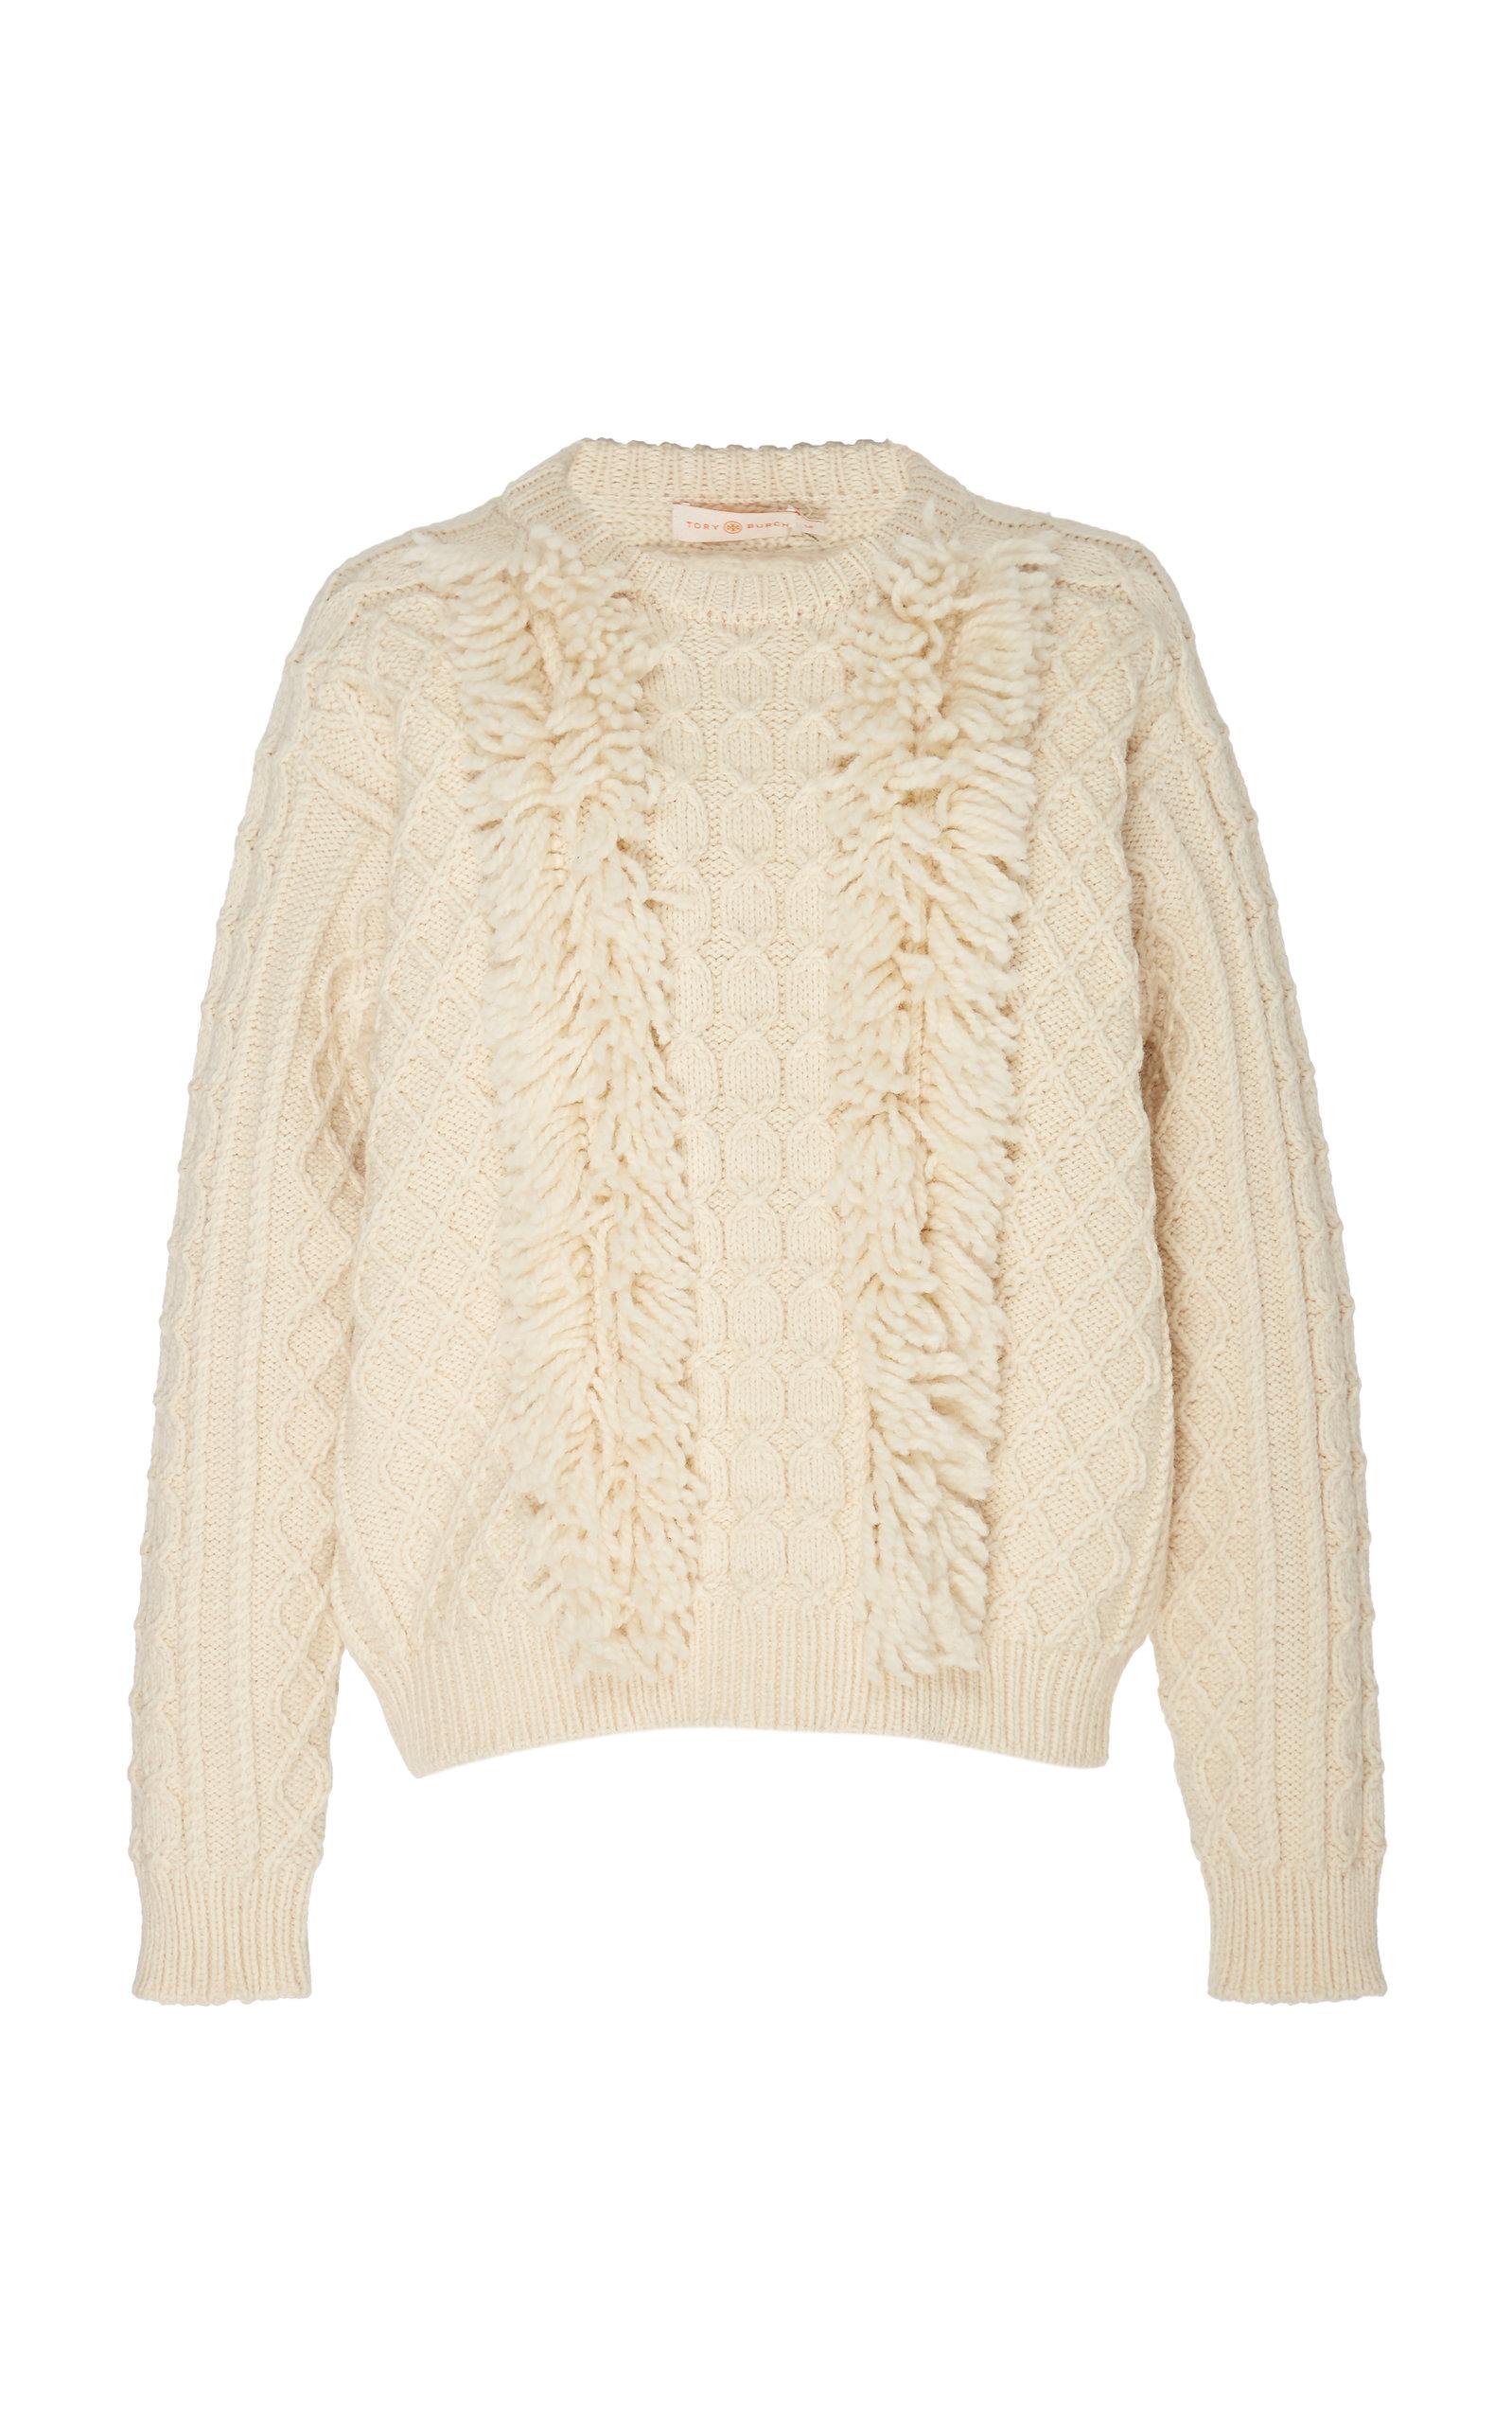 TORY BURCH | Tory Burch Wool Fringe Sweater | Goxip